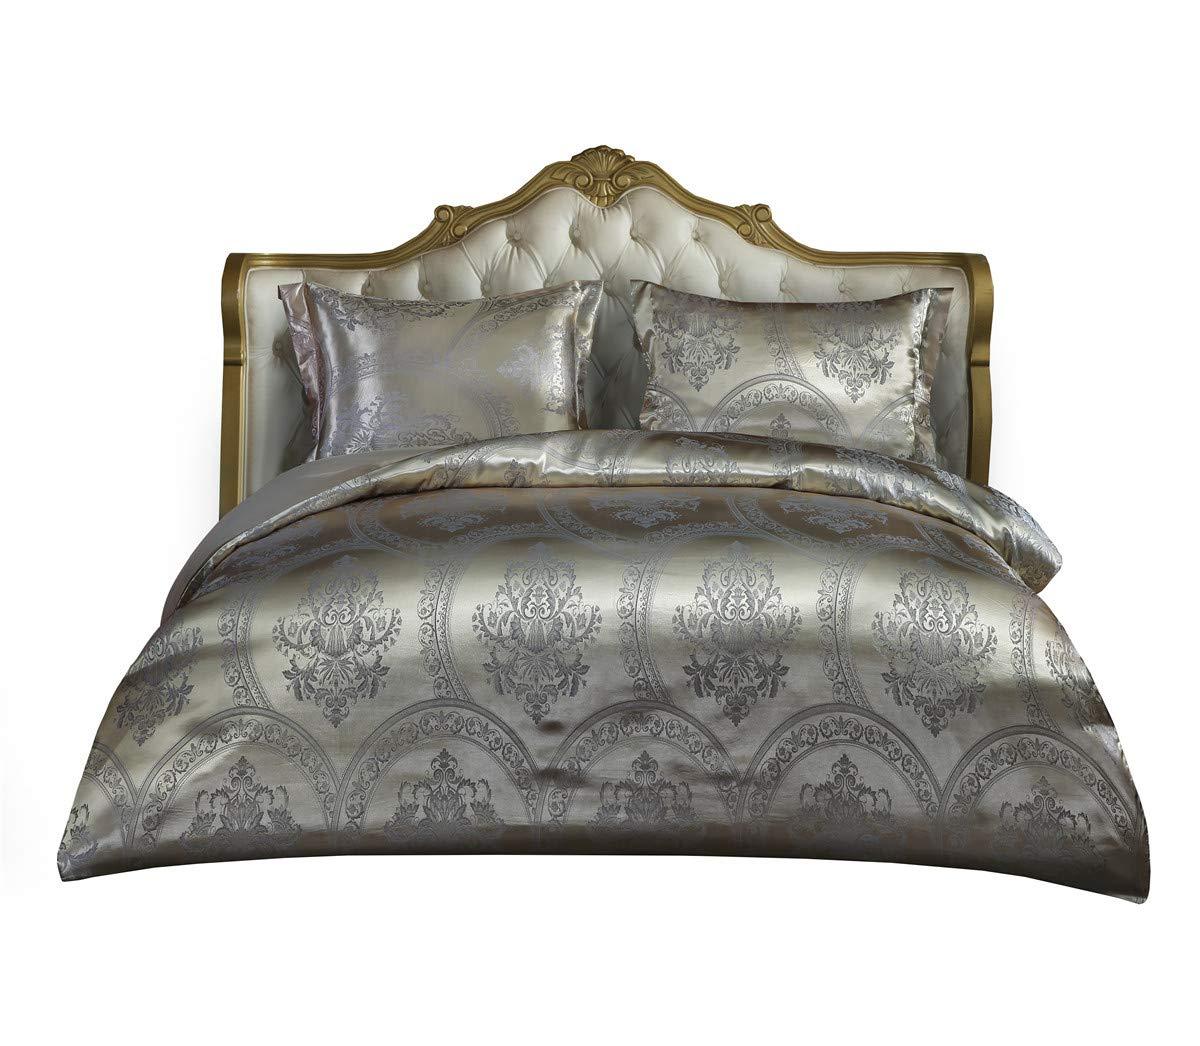 Kess InHouse Oriana Cordero Horizon Orange Sky 23 x 23 Square Floor Pillow